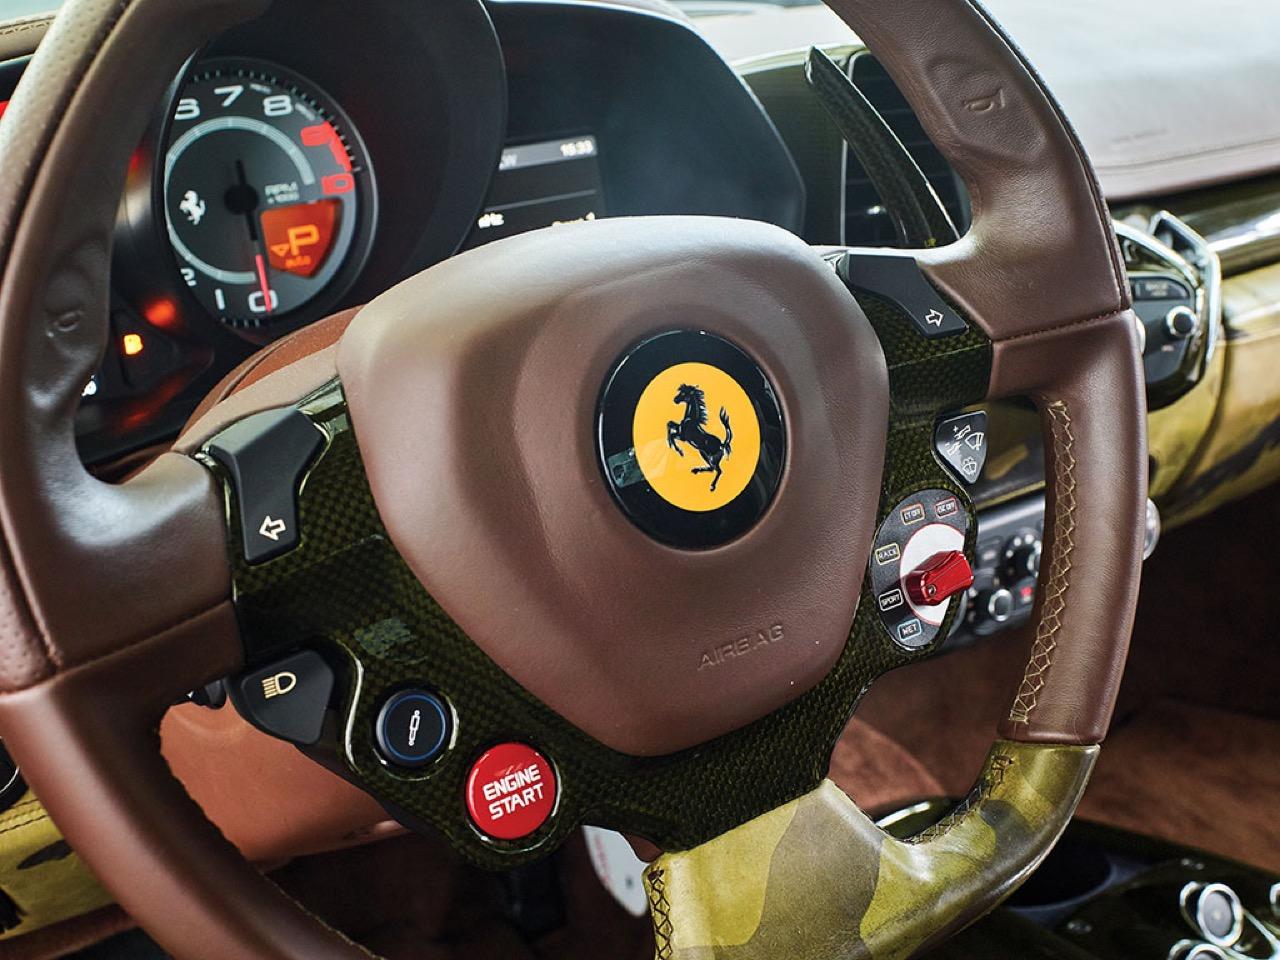 Ferrari 458 Italia Lapo Elkann in auction (14)